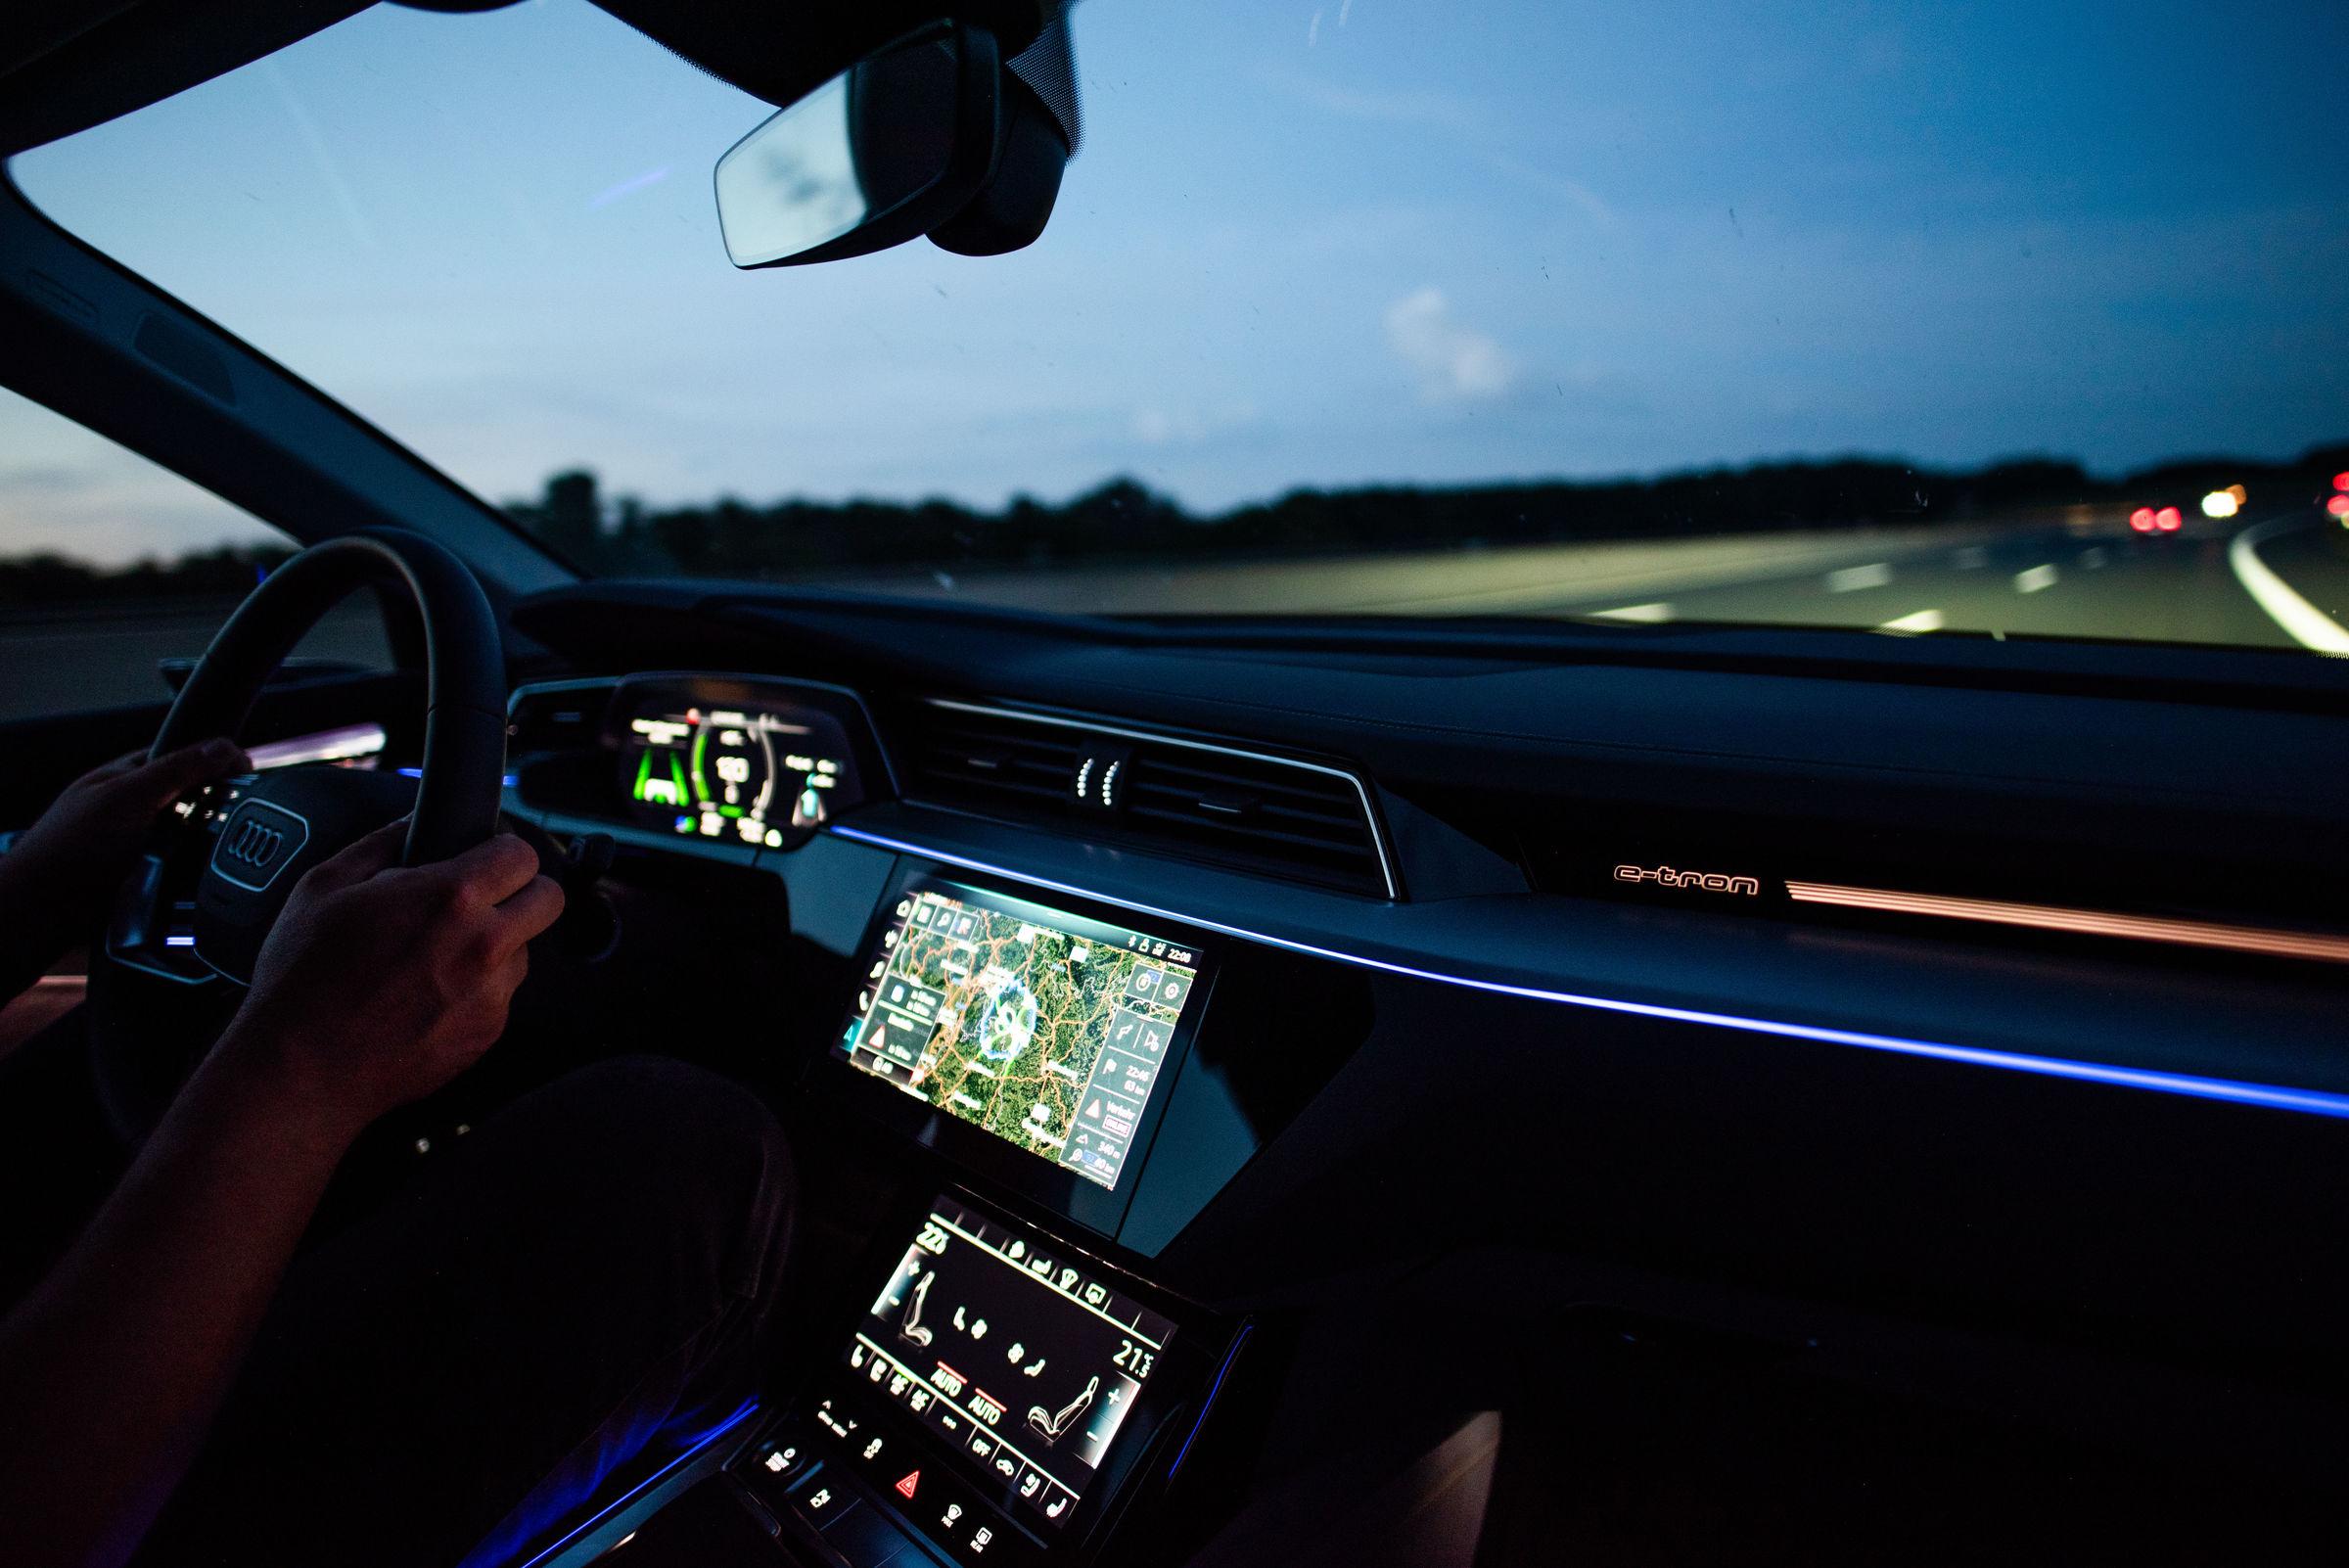 Audi e-tron dashboard at night